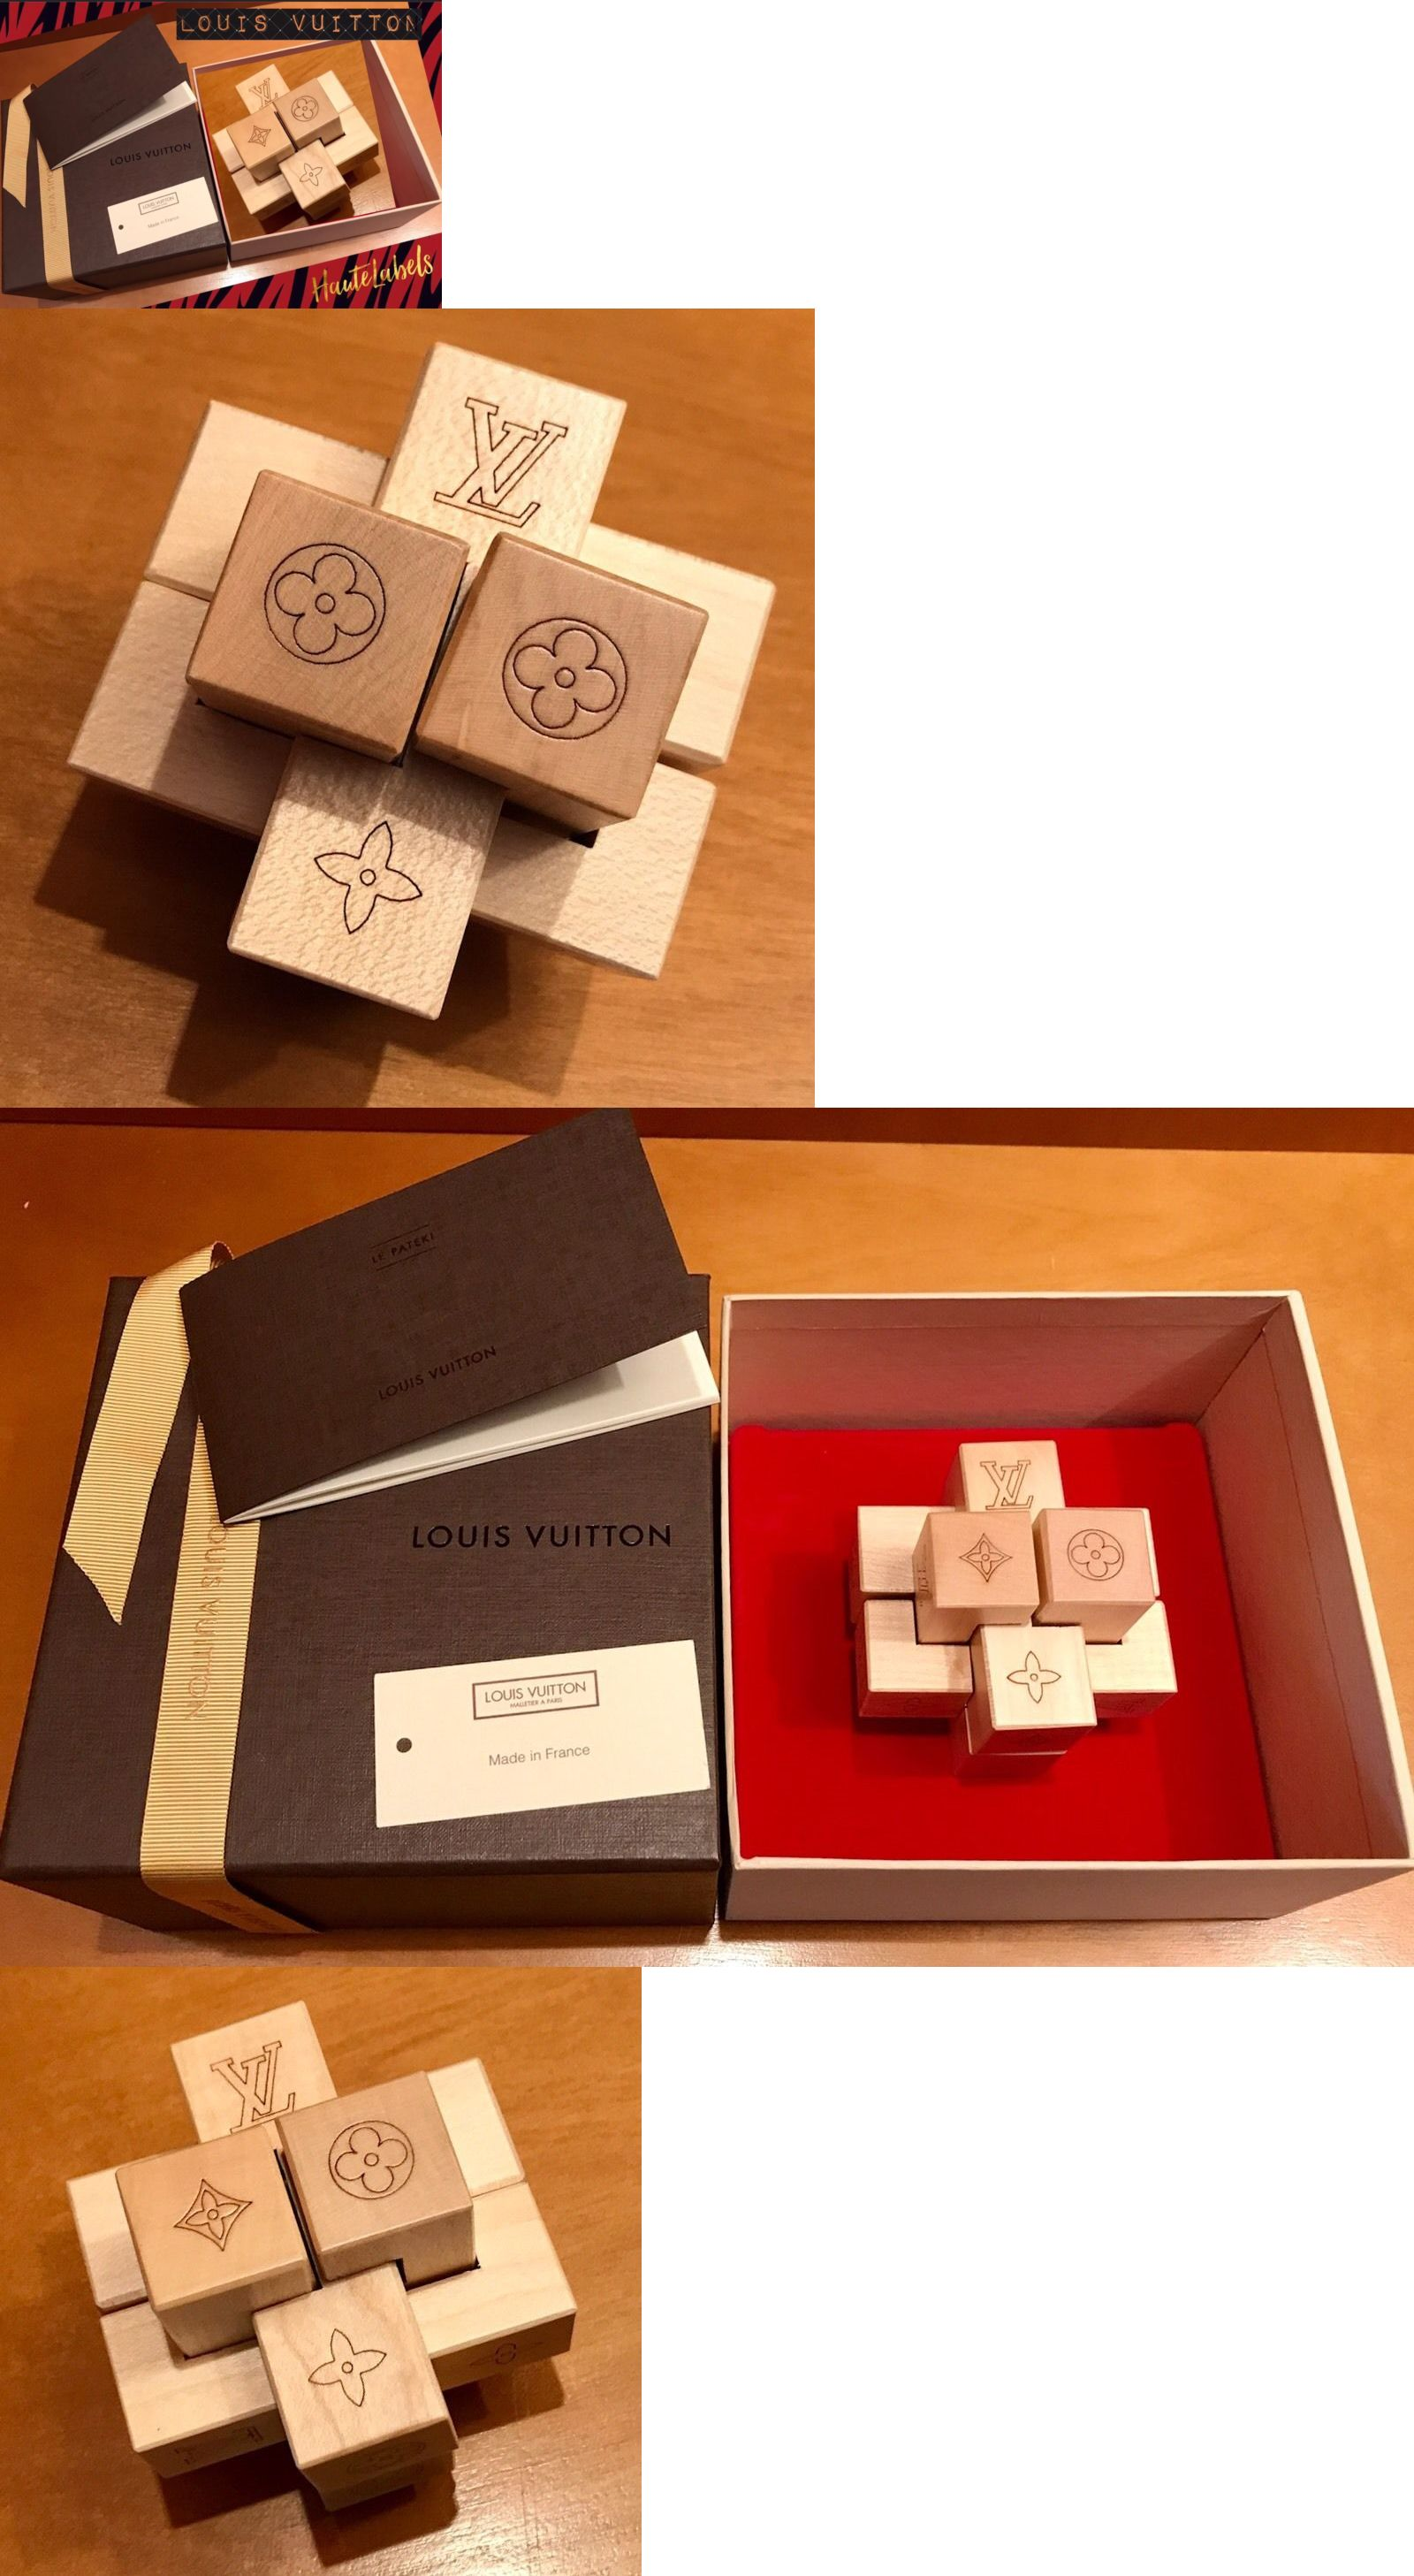 Wooden authentic louis vuitton vip gift le pateki puzzle in